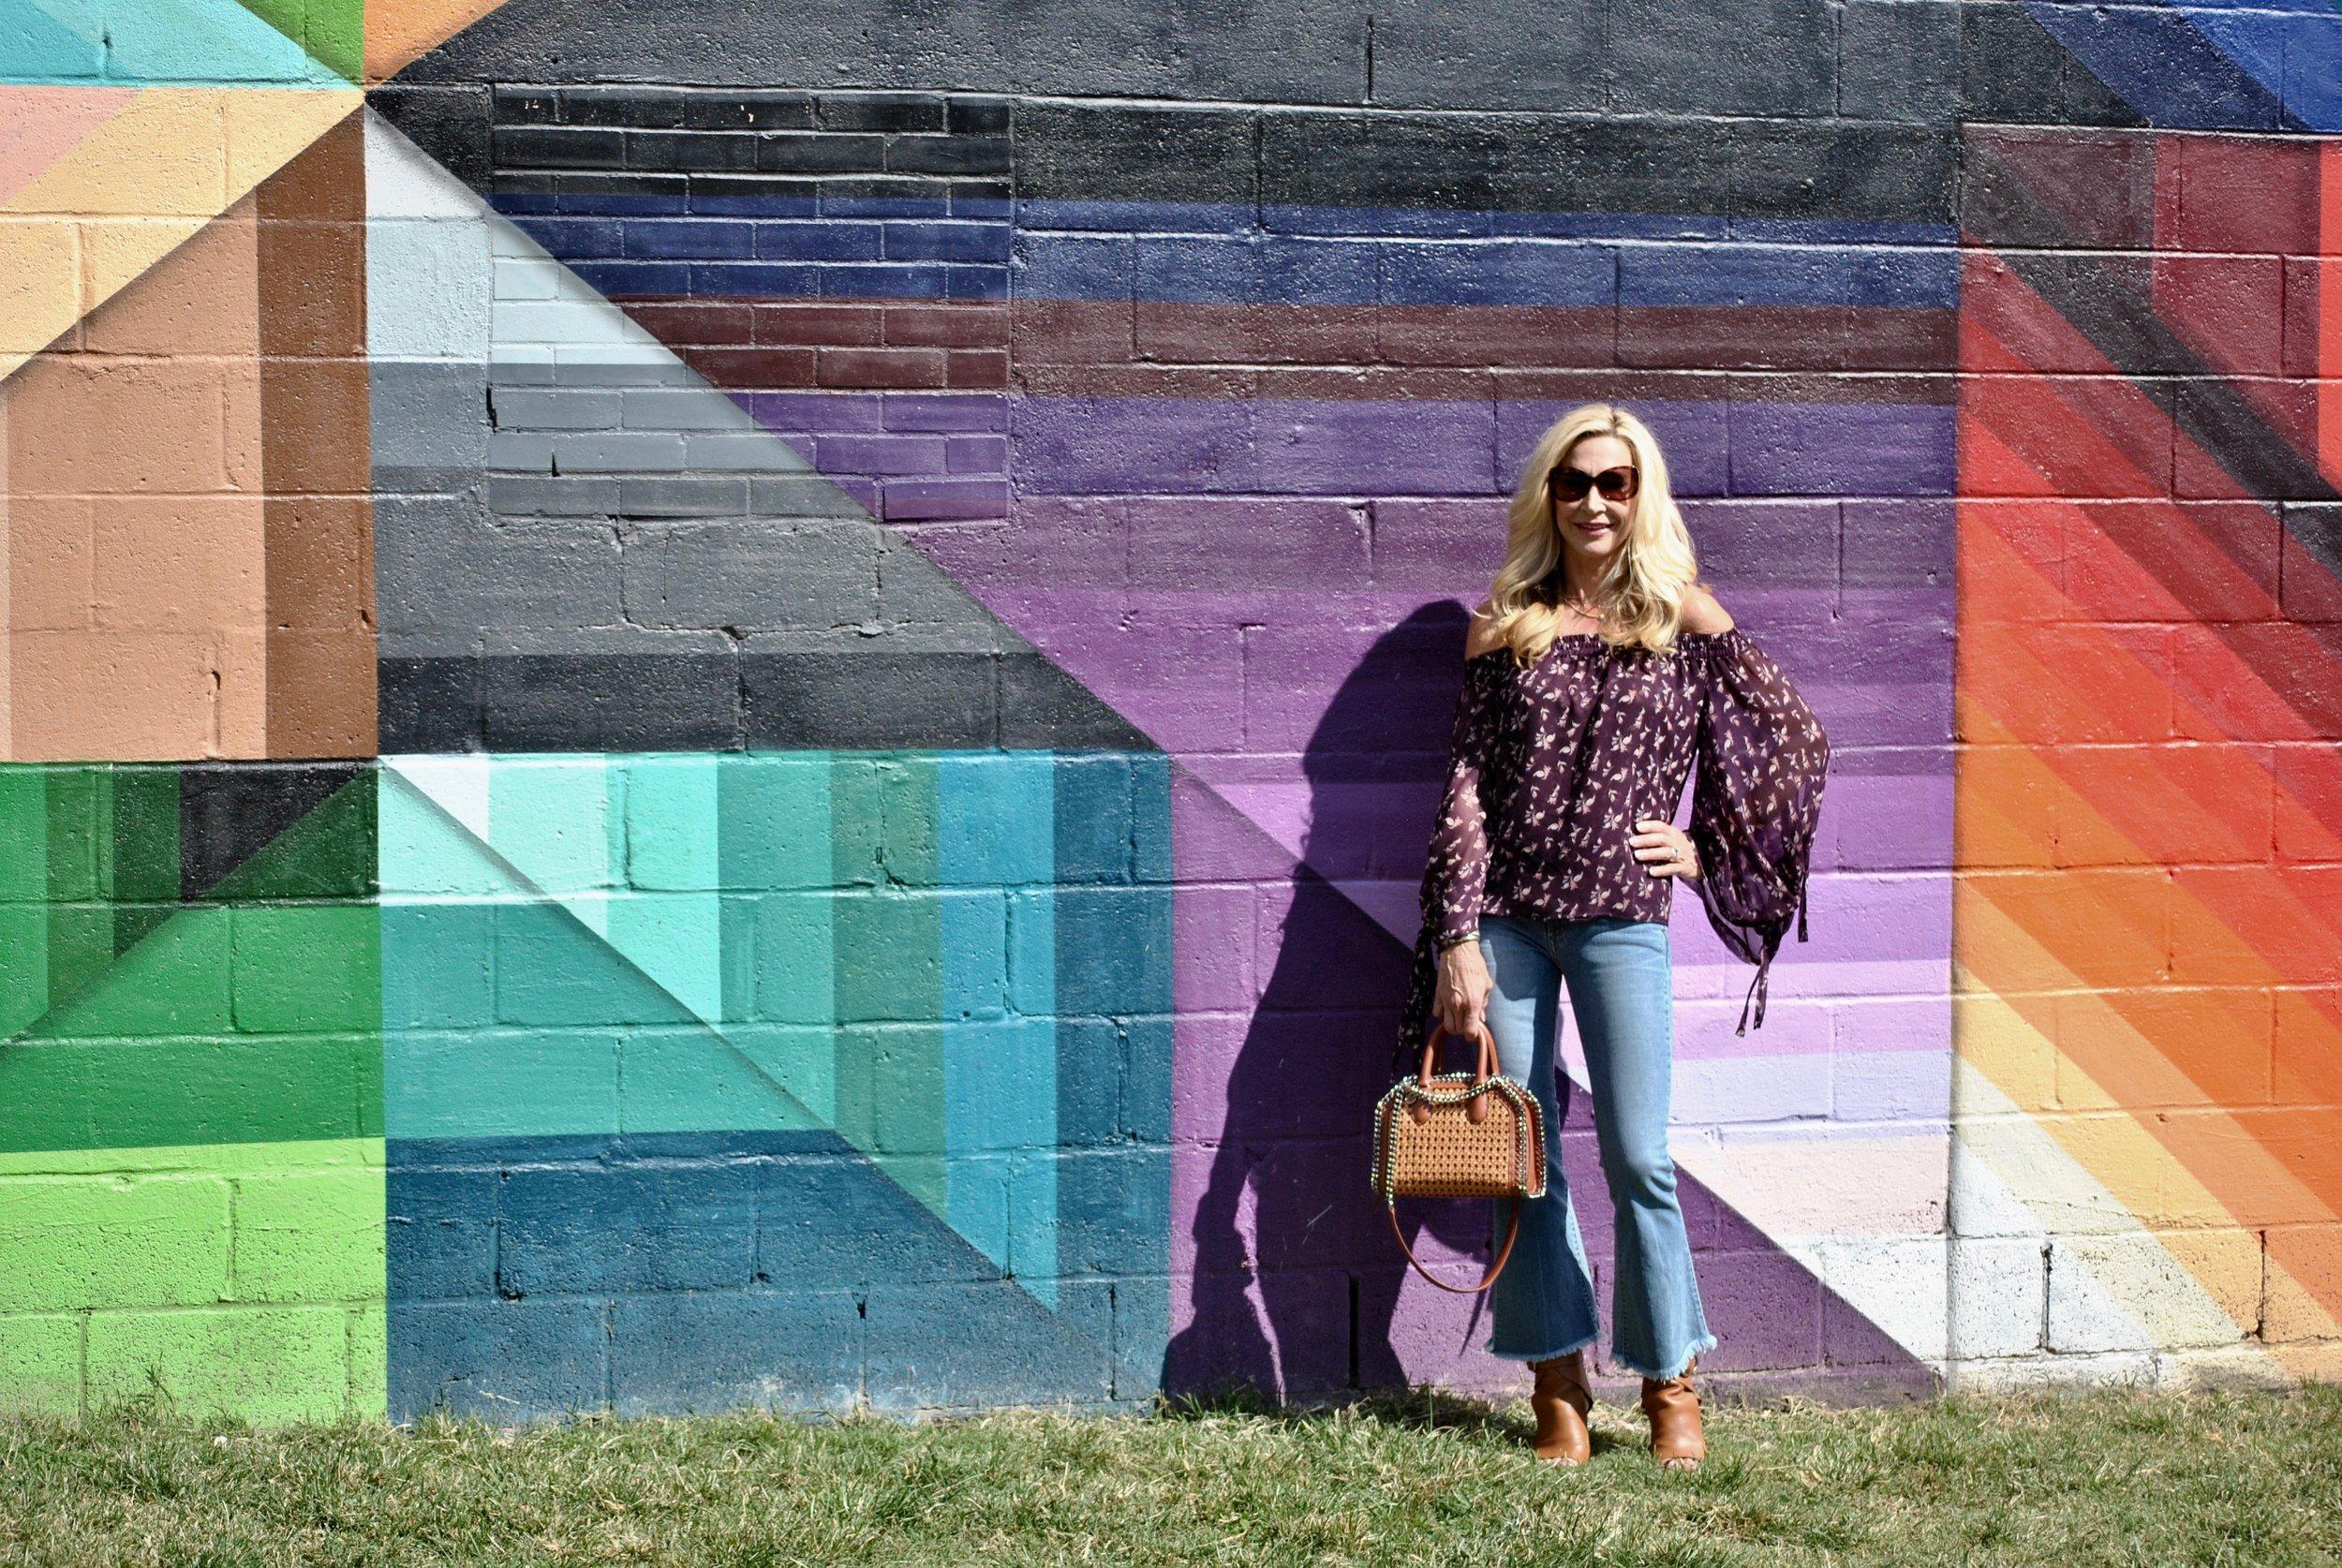 Mural in The Gulch Nashville